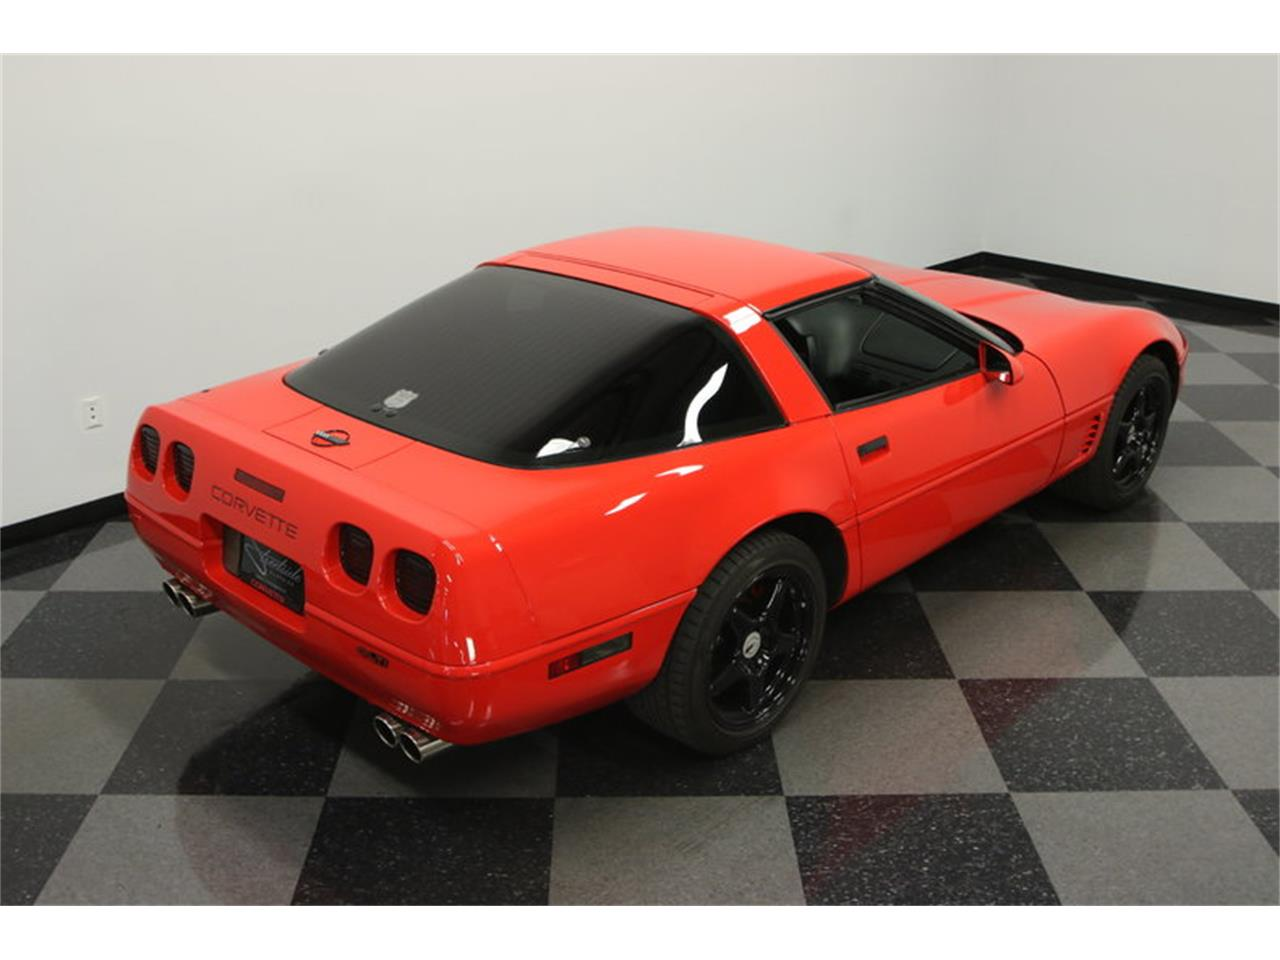 Large Picture of '95 Chevrolet Corvette - $15,995.00 - IURO